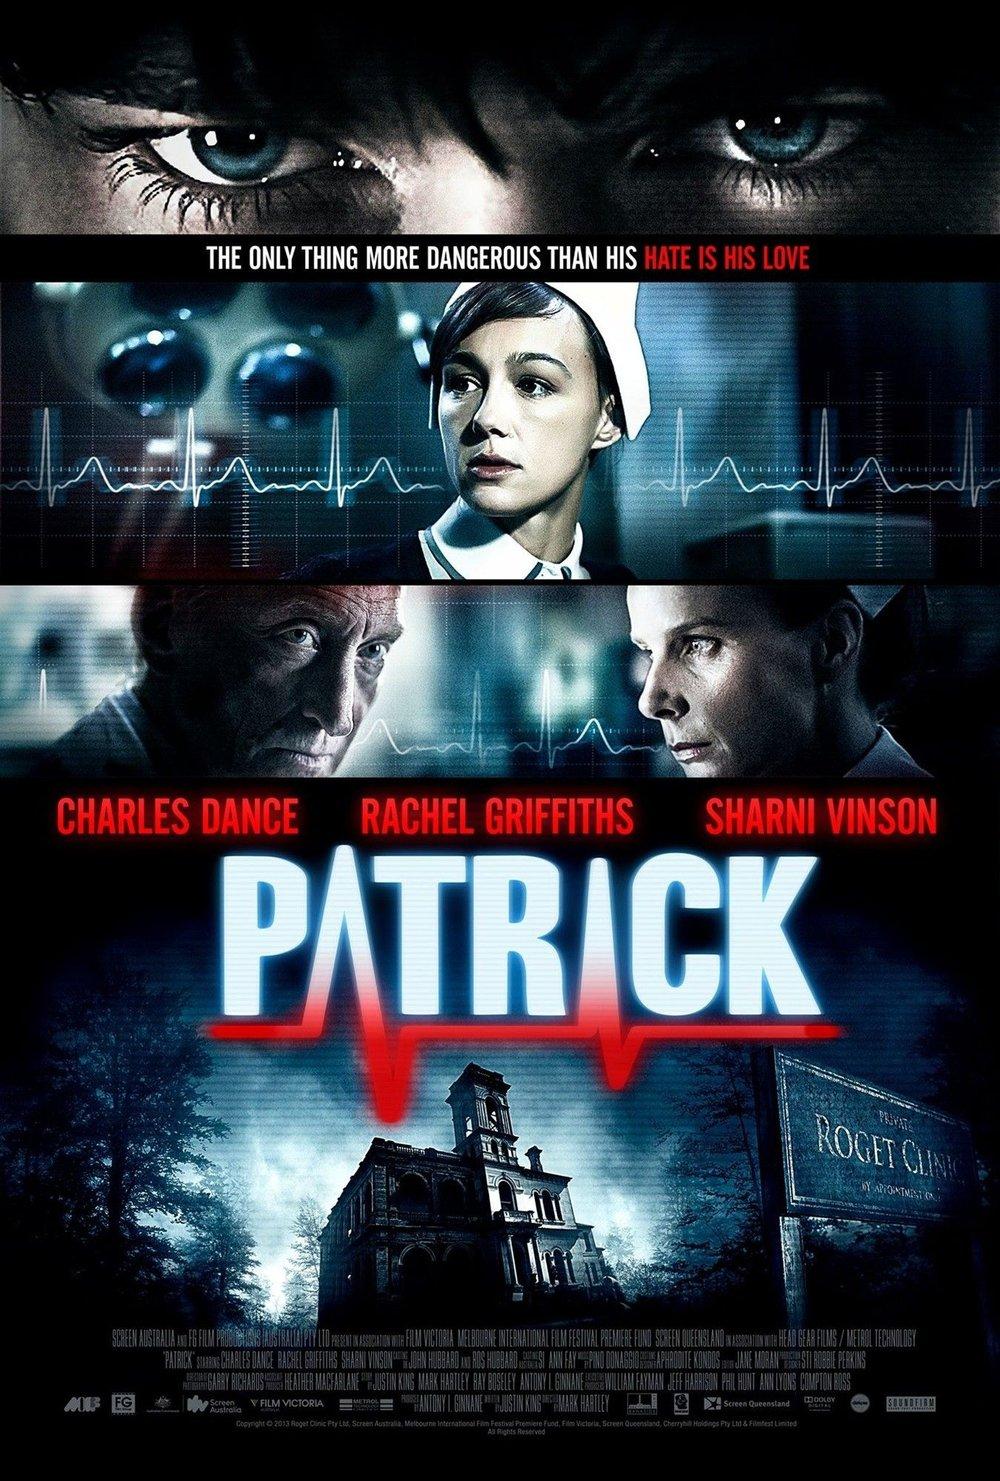 patrick-poster04.jpg